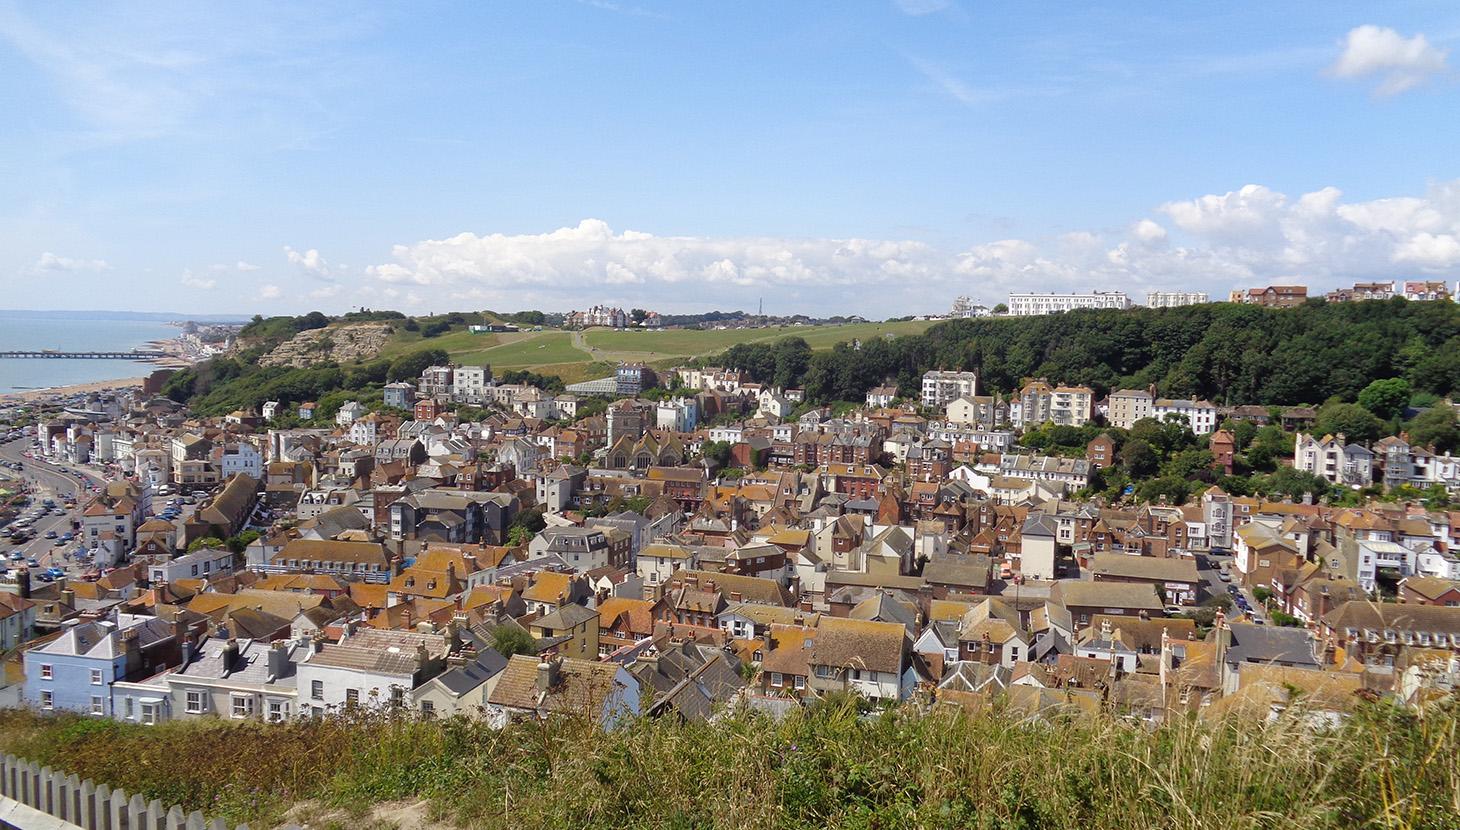 hastings-old-town-1460